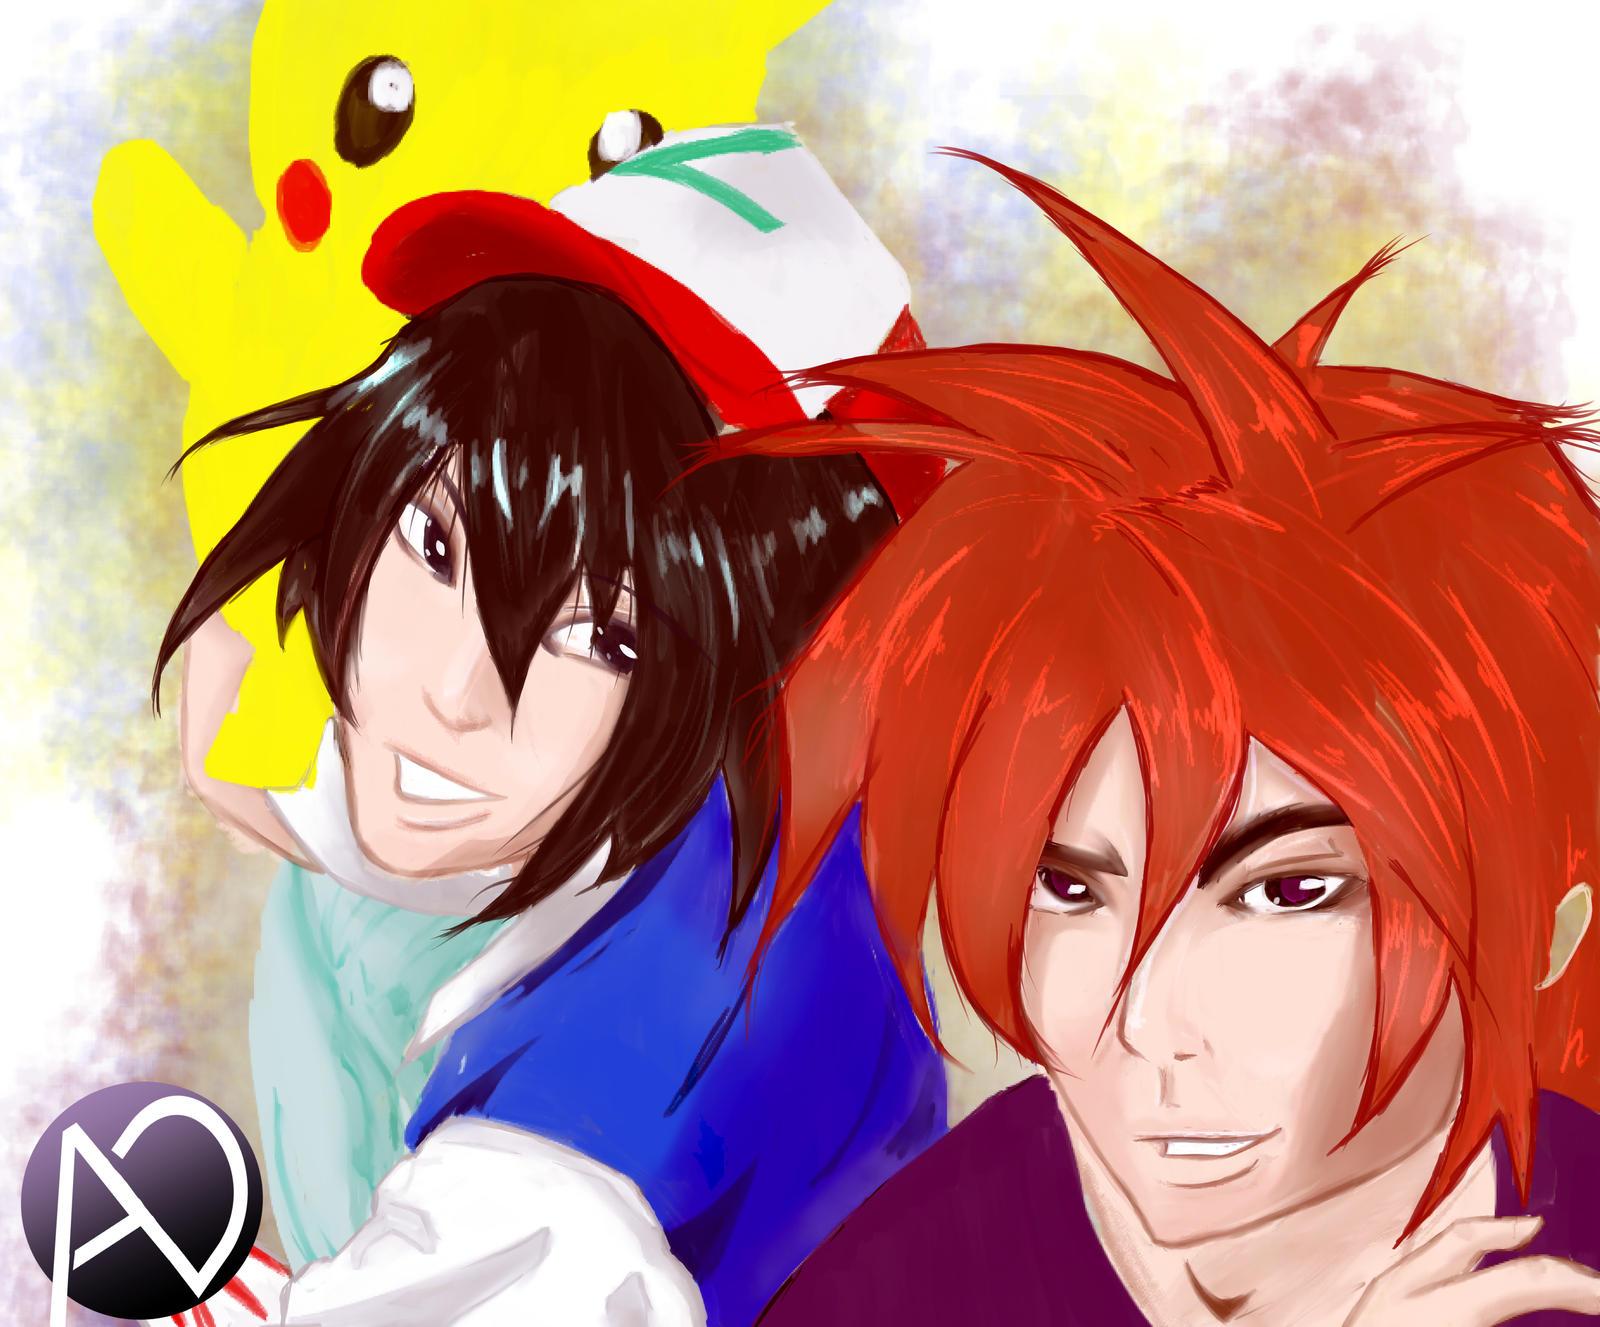 Rivals and Friends - Pokemon Fanart by avenirdesign